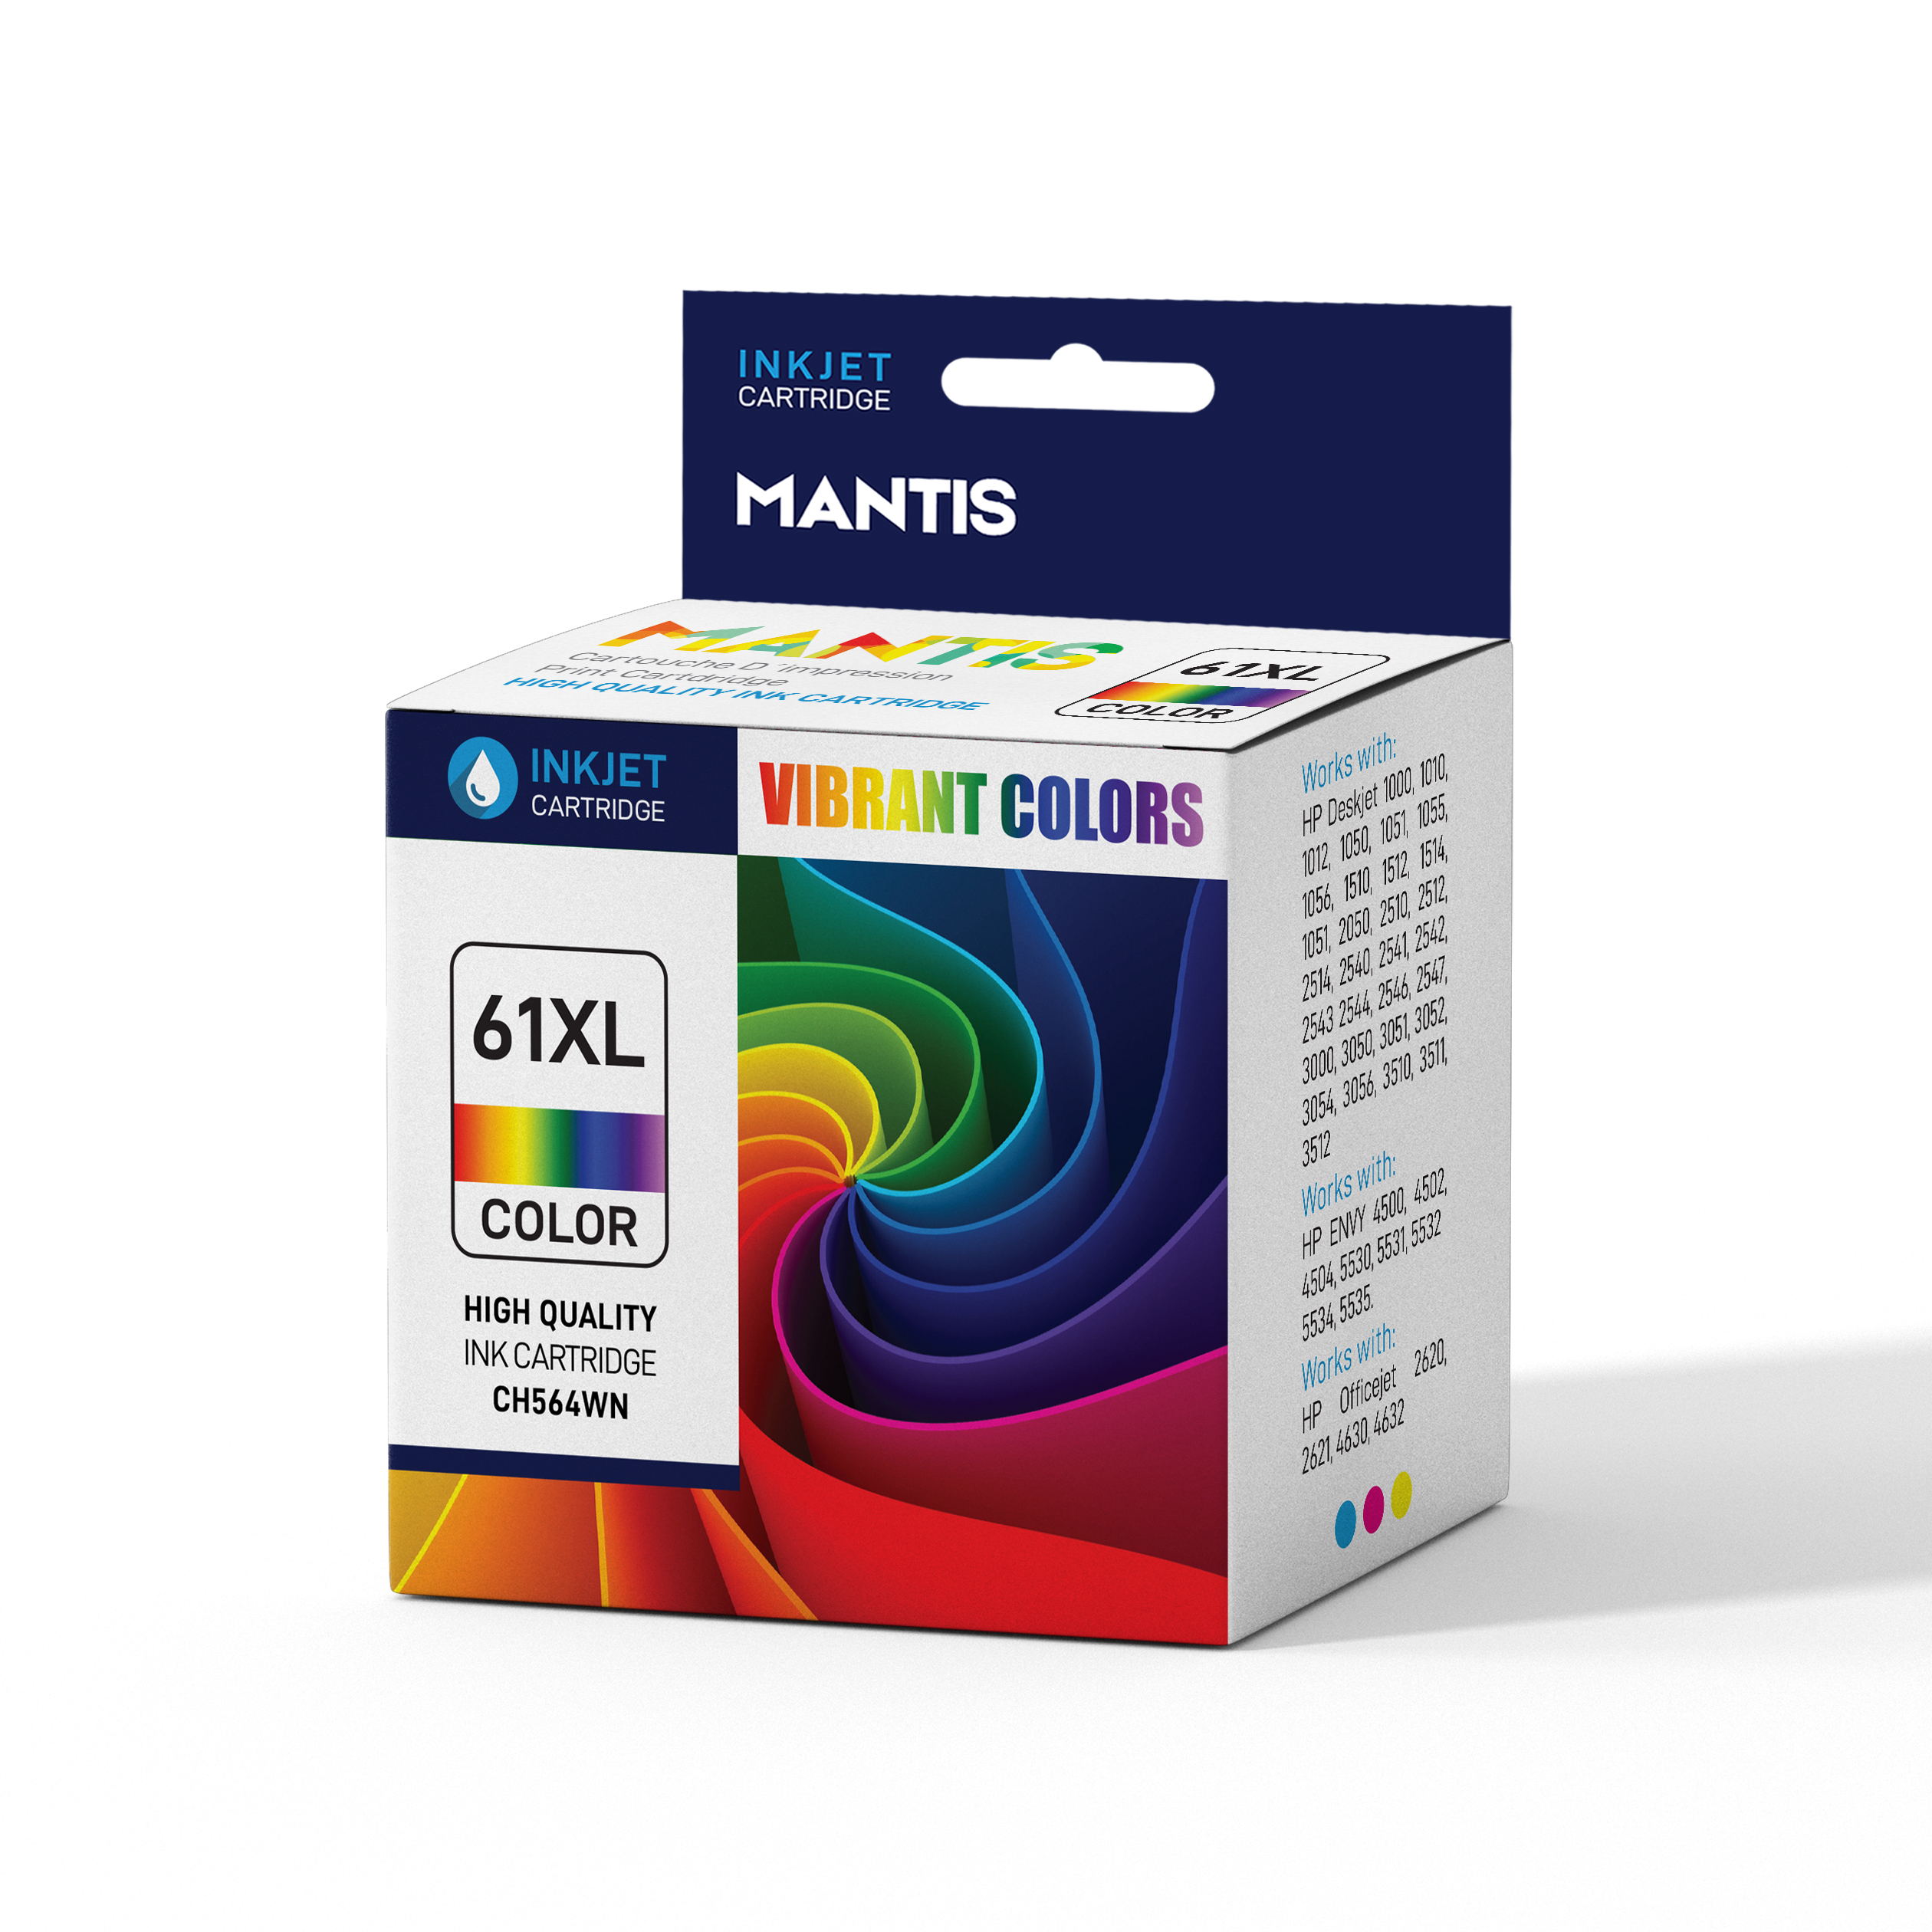 High Yield for HP Deskjet 1000 1010 1012 CH563WN HP 61XL Black Ink Cartridge